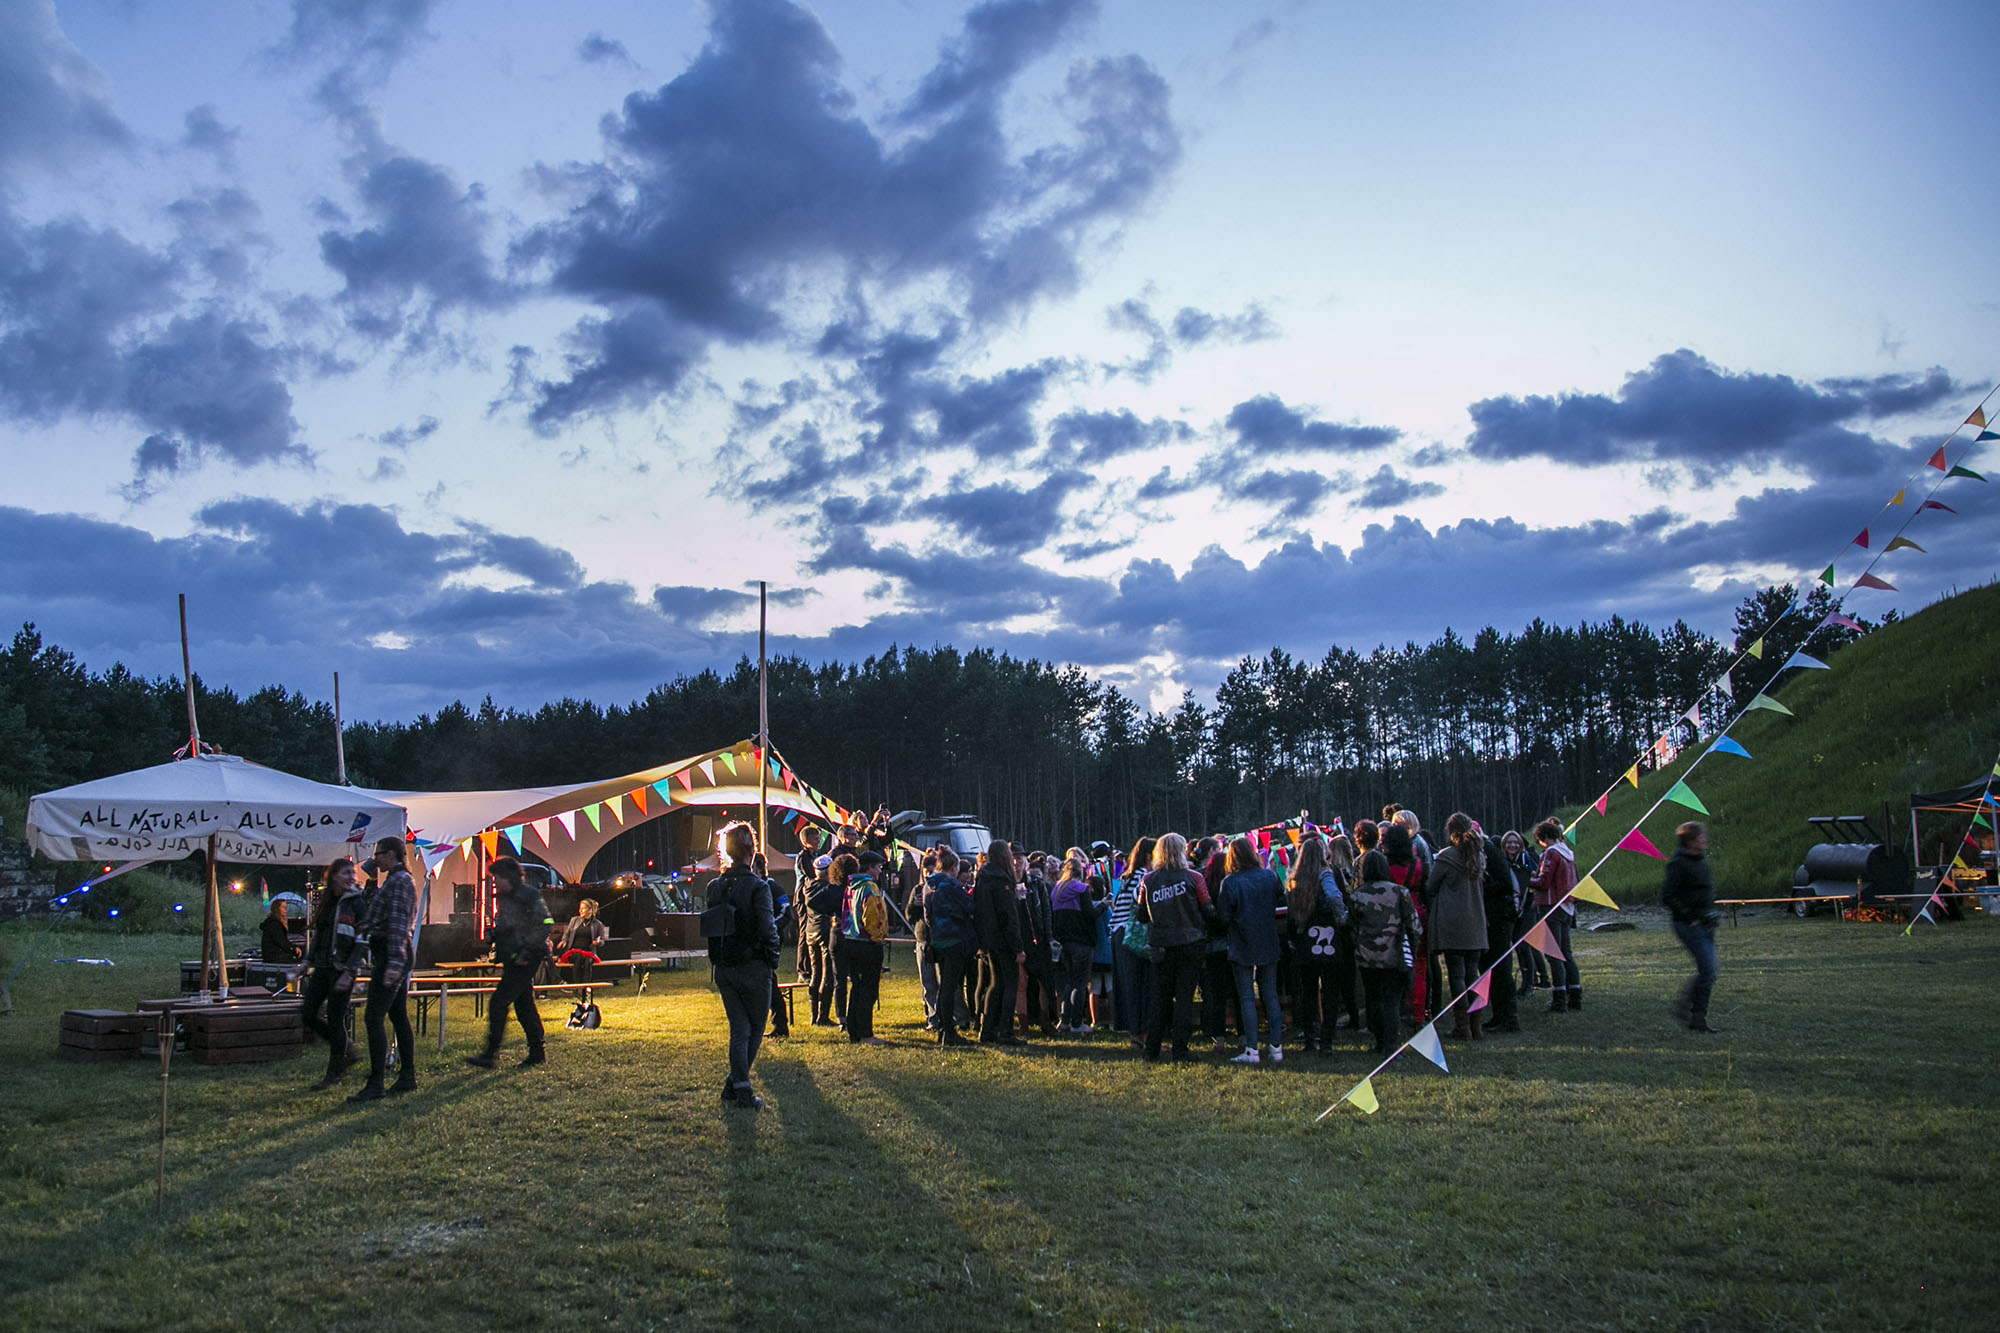 Petrolettes Festival (Neuhardenberg airfield, Germany)